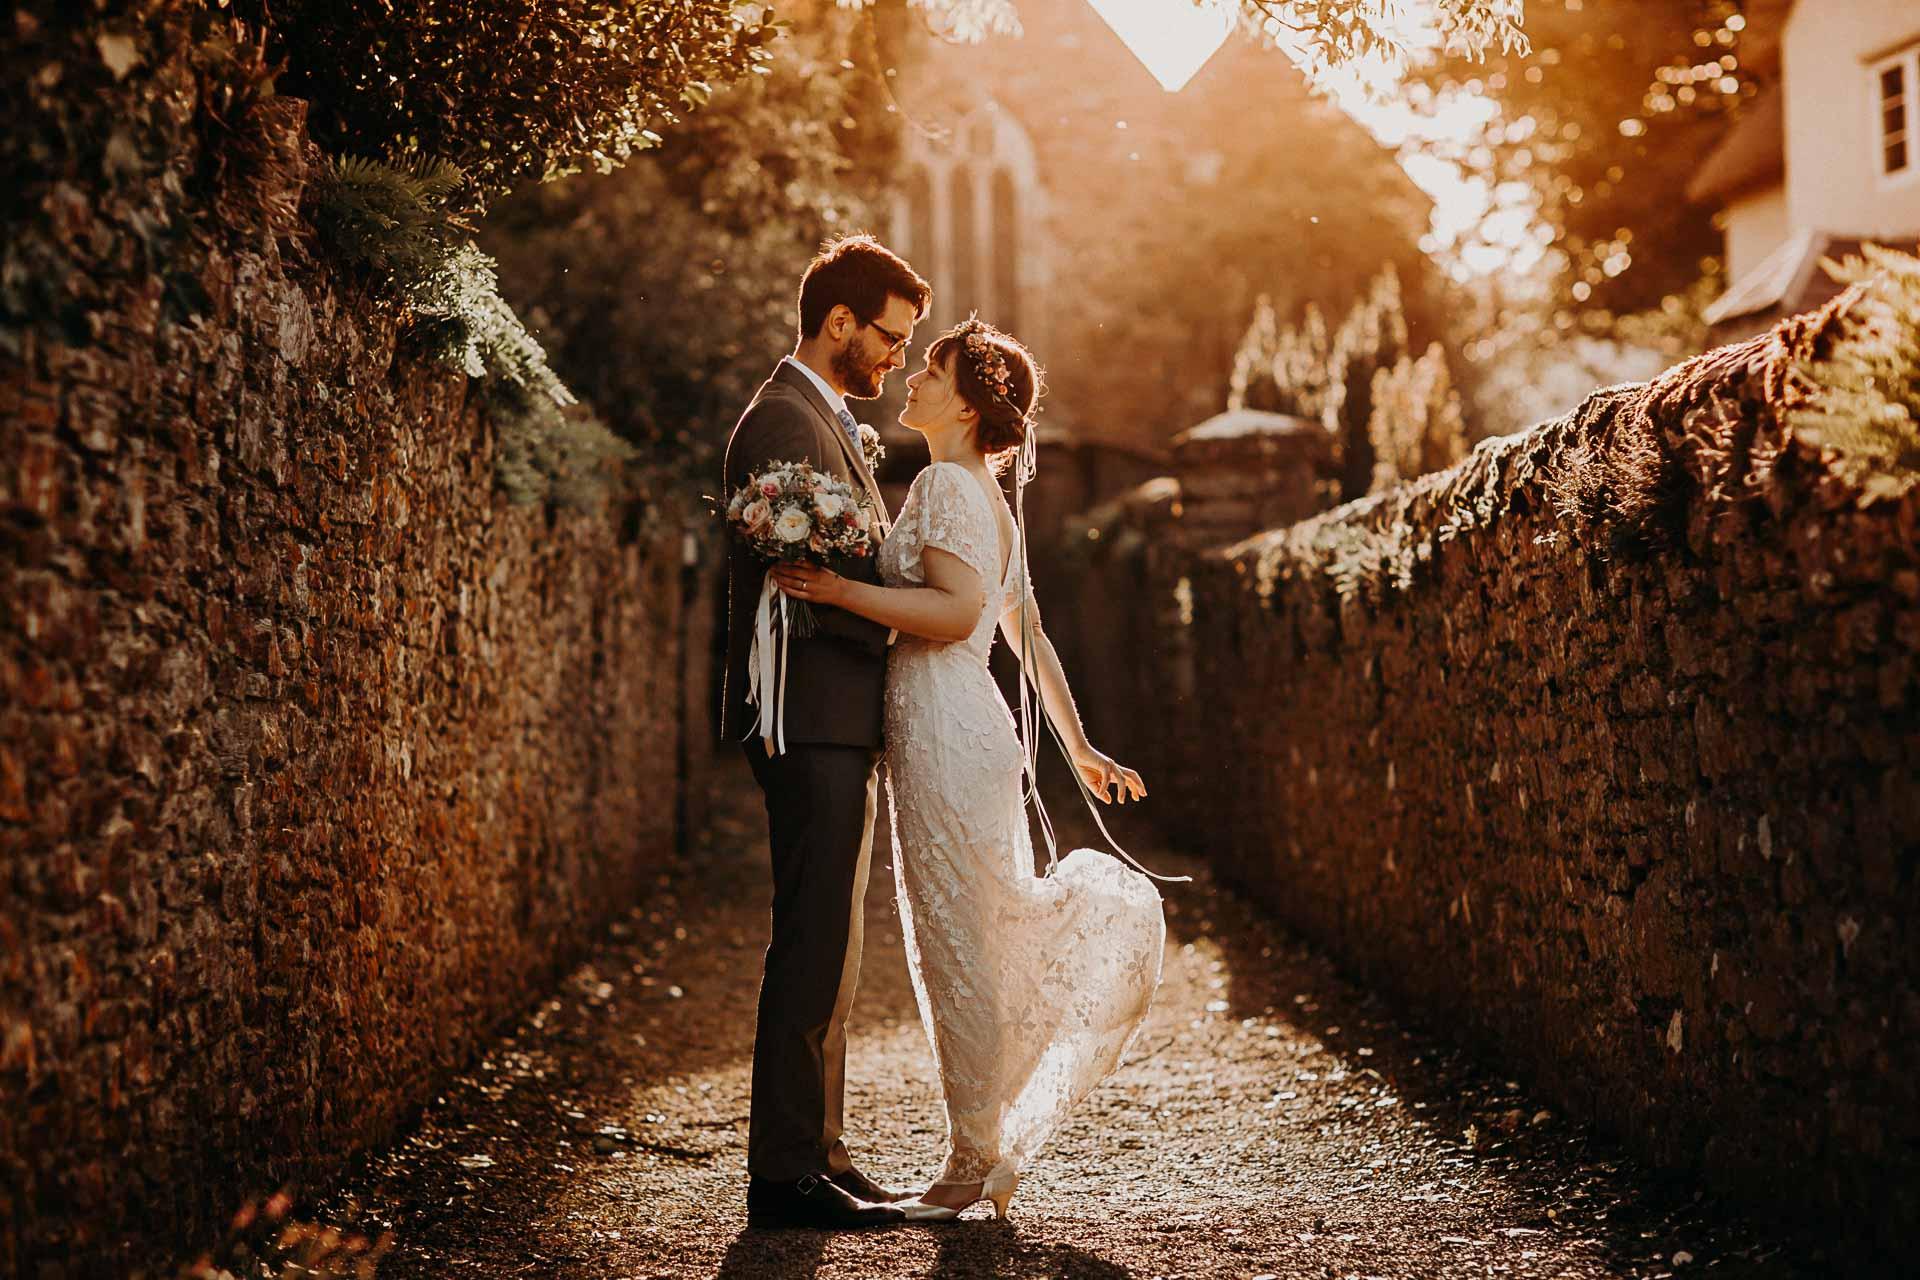 Best Wedding Photographer Award  Dan Ward Photography